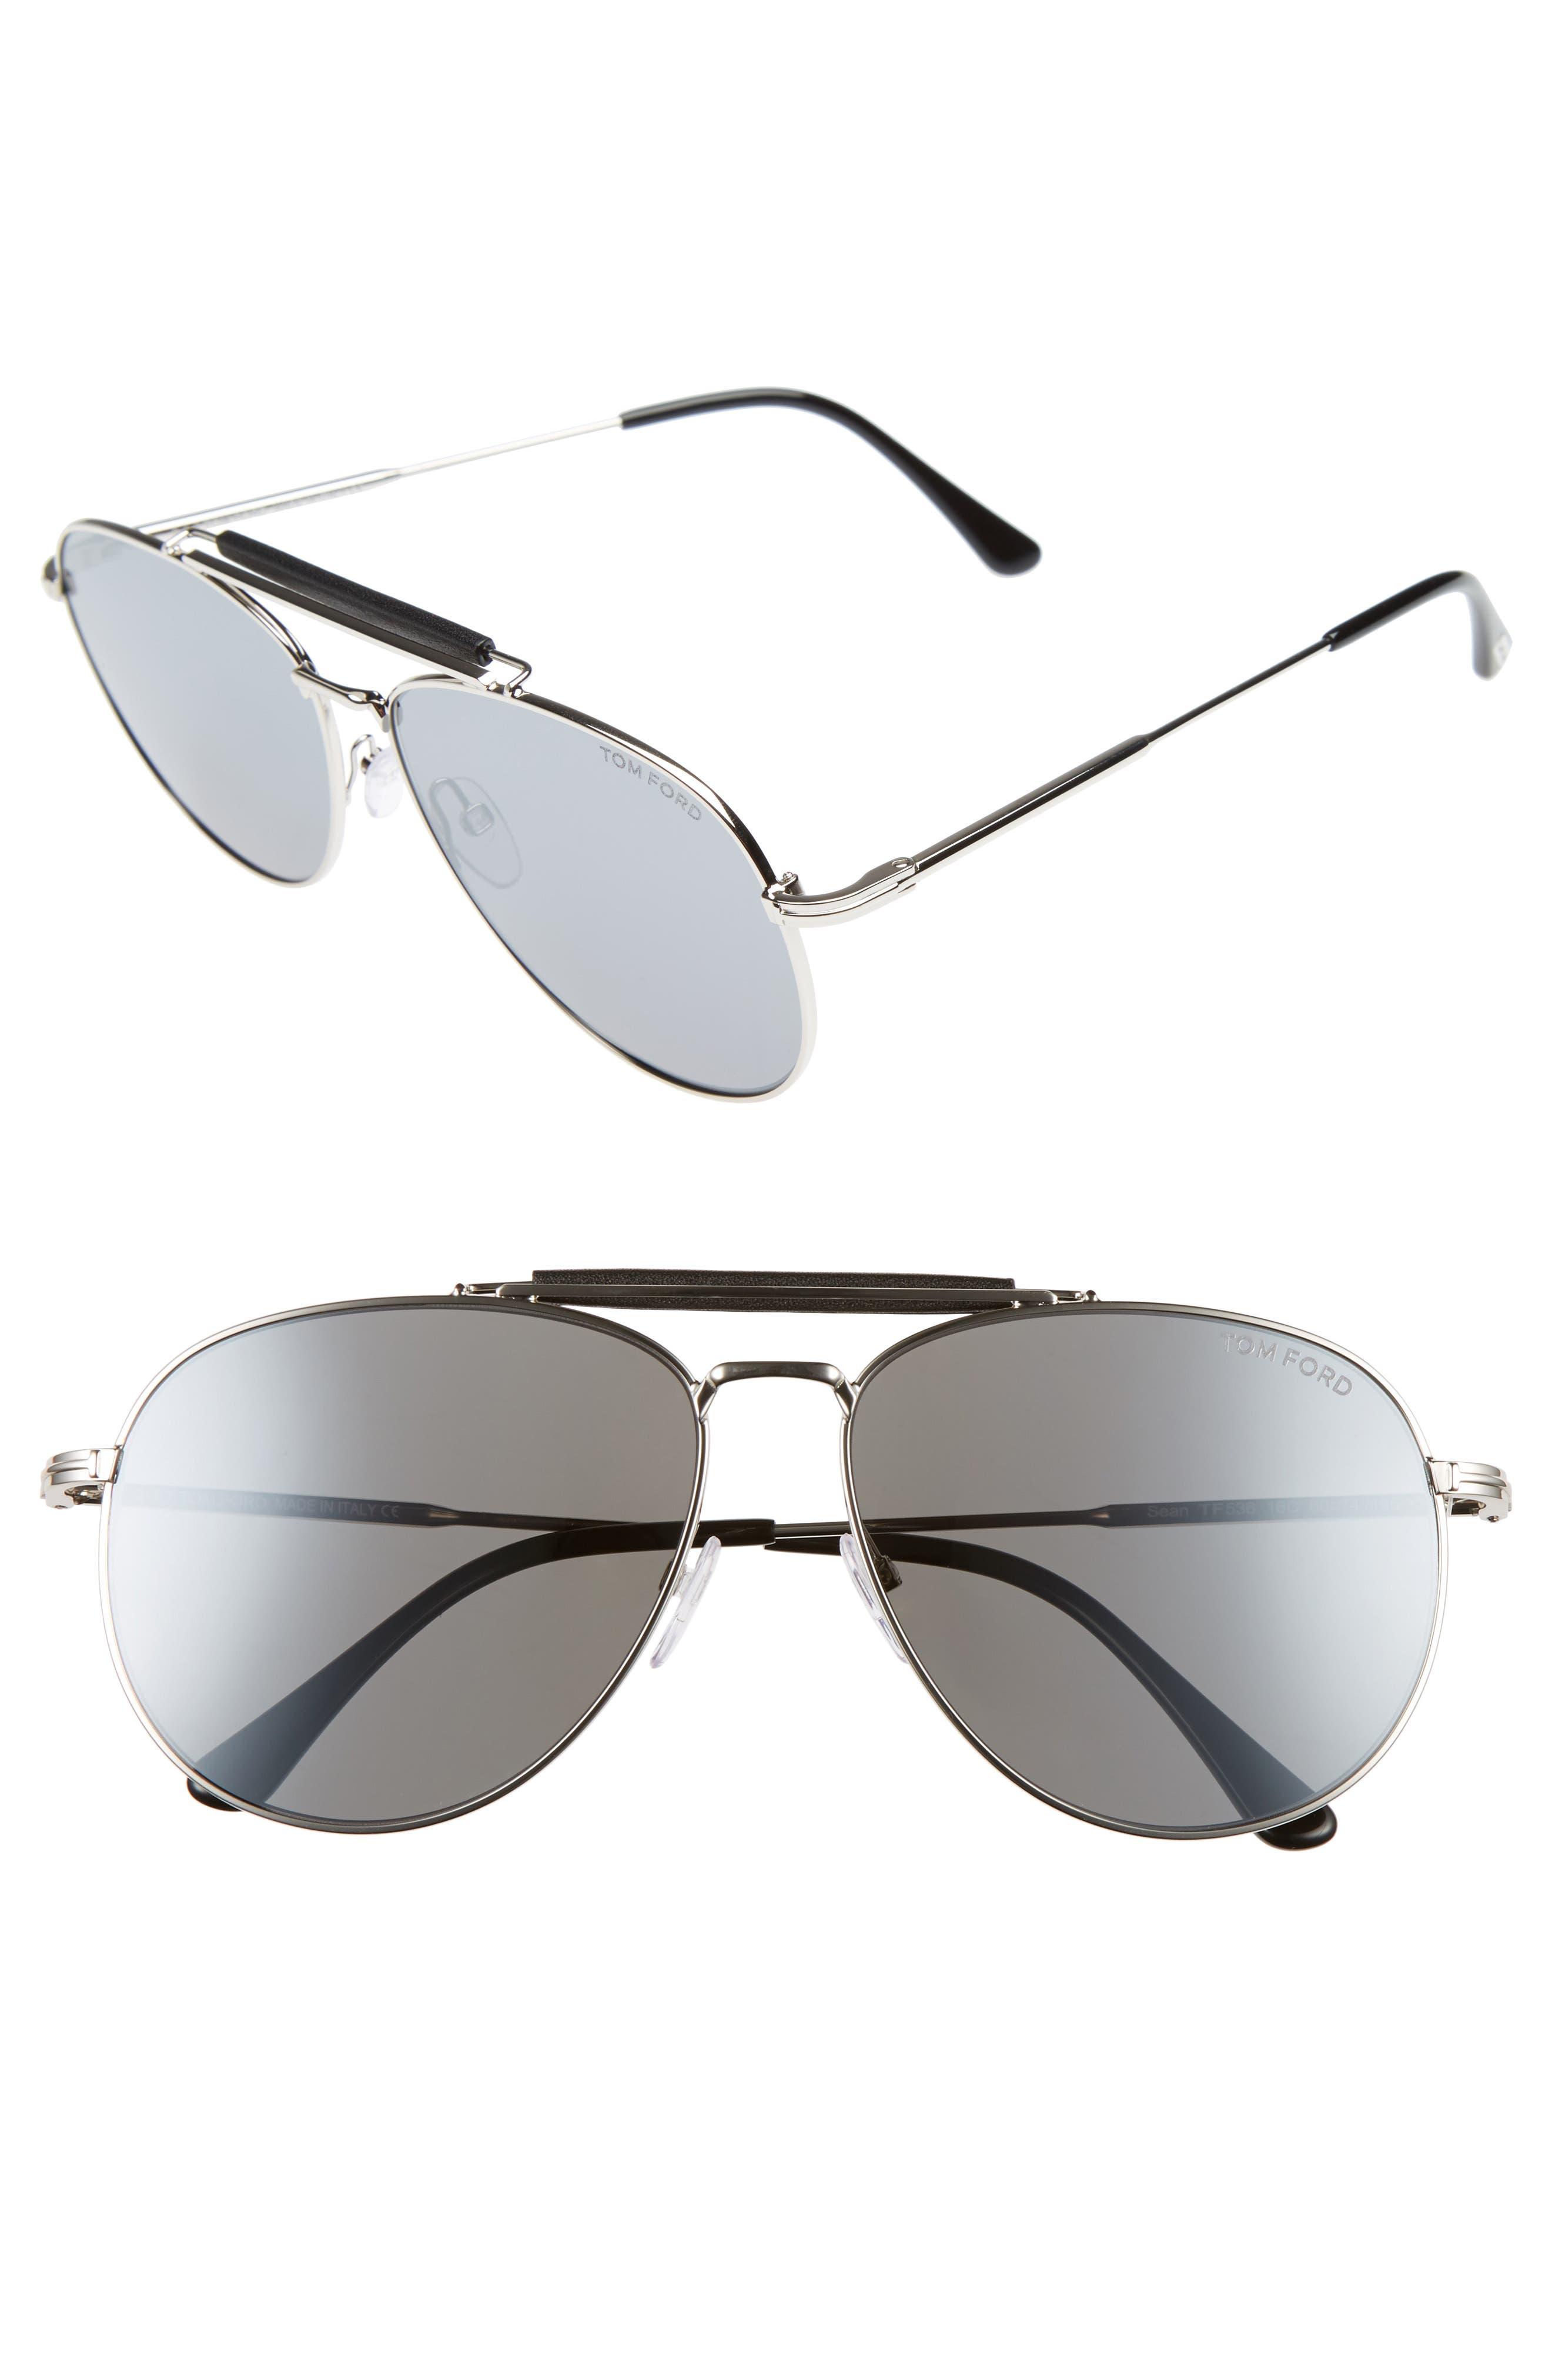 Sean 61mm Aviator Sunglasses,                             Main thumbnail 1, color,                             SHINY PALLADIUM / SMOKE MIRROR